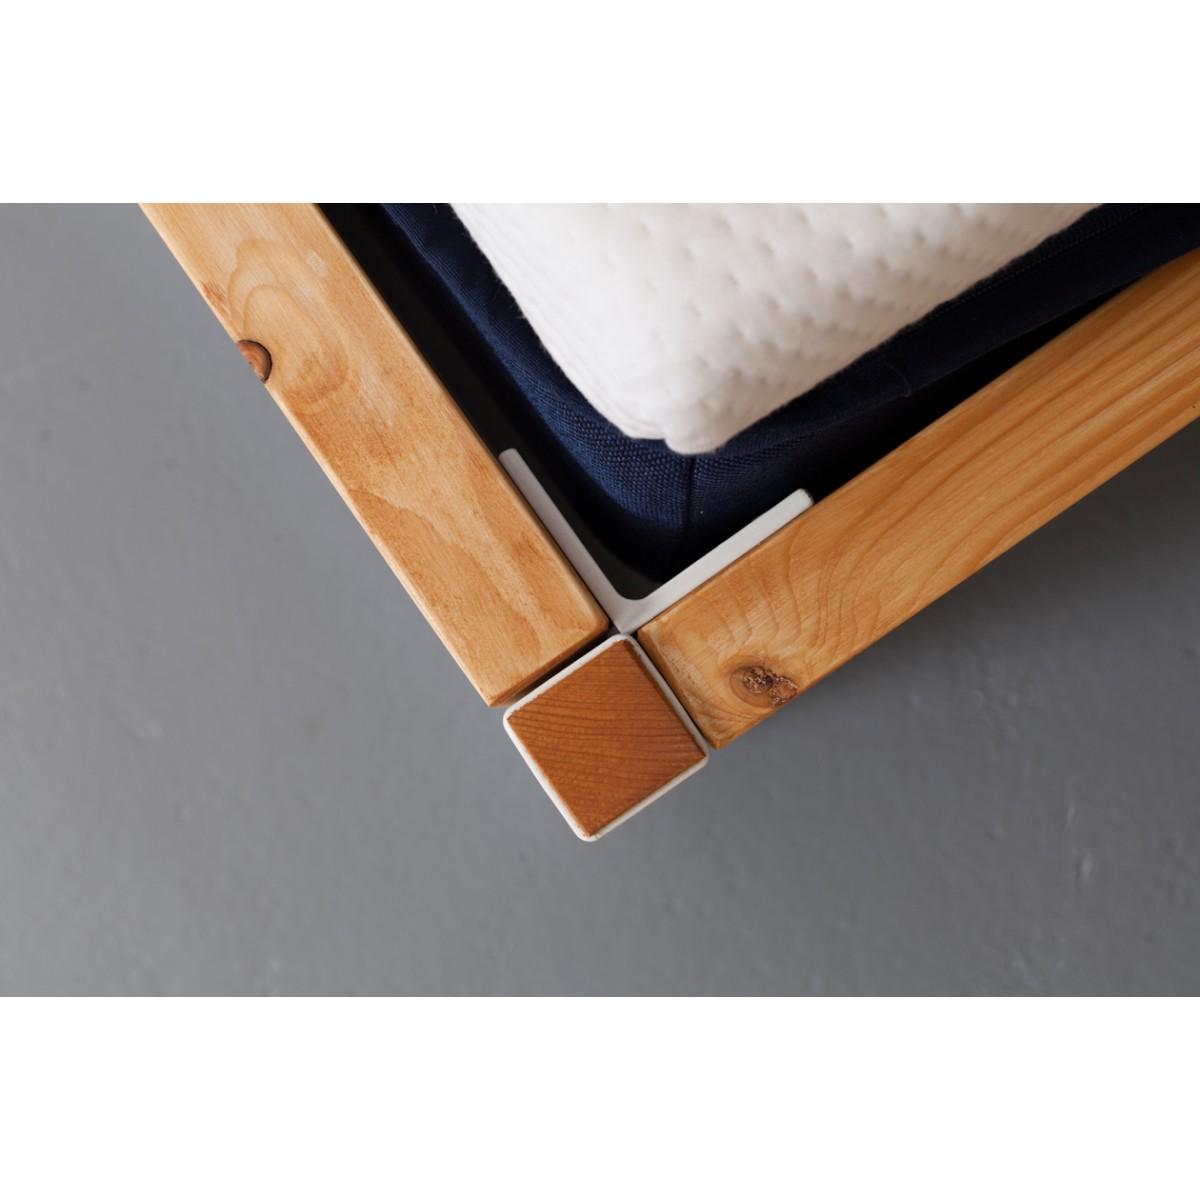 JOHANENLIES | Upcycling Bett aus recyceltem Bauholz u. Stahl | LUBERON NATUR